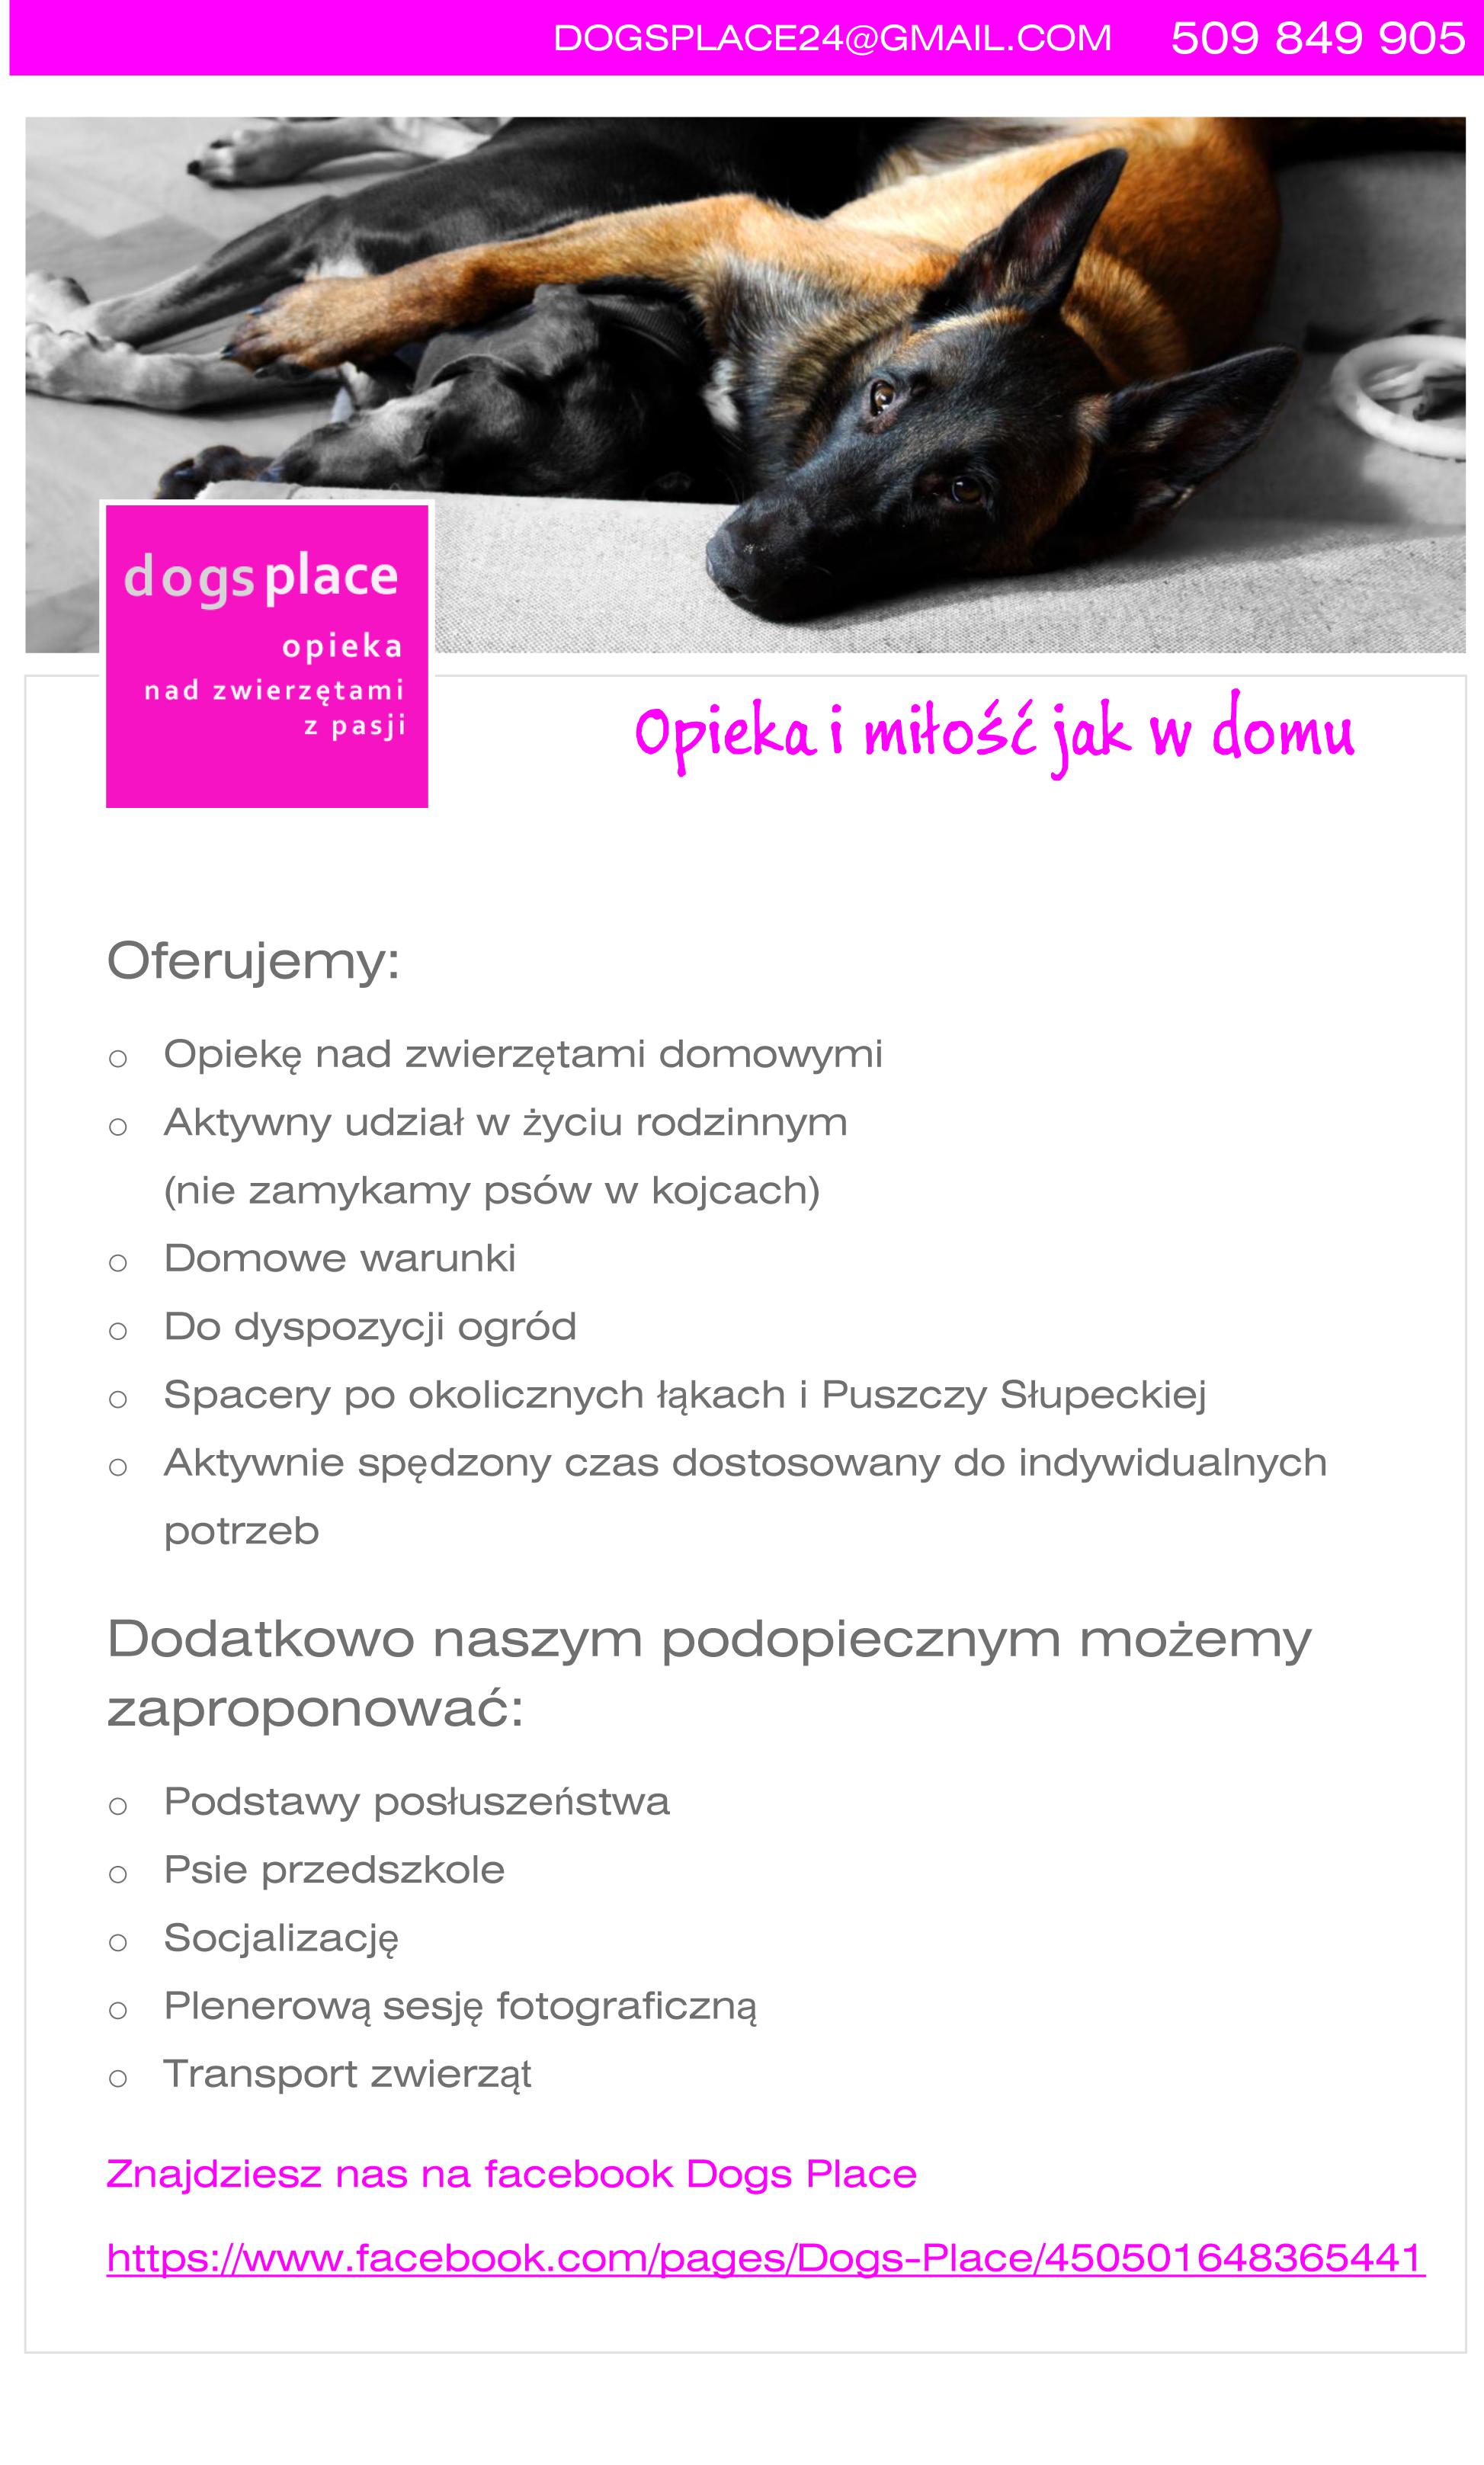 dogsplace24@gmail.com